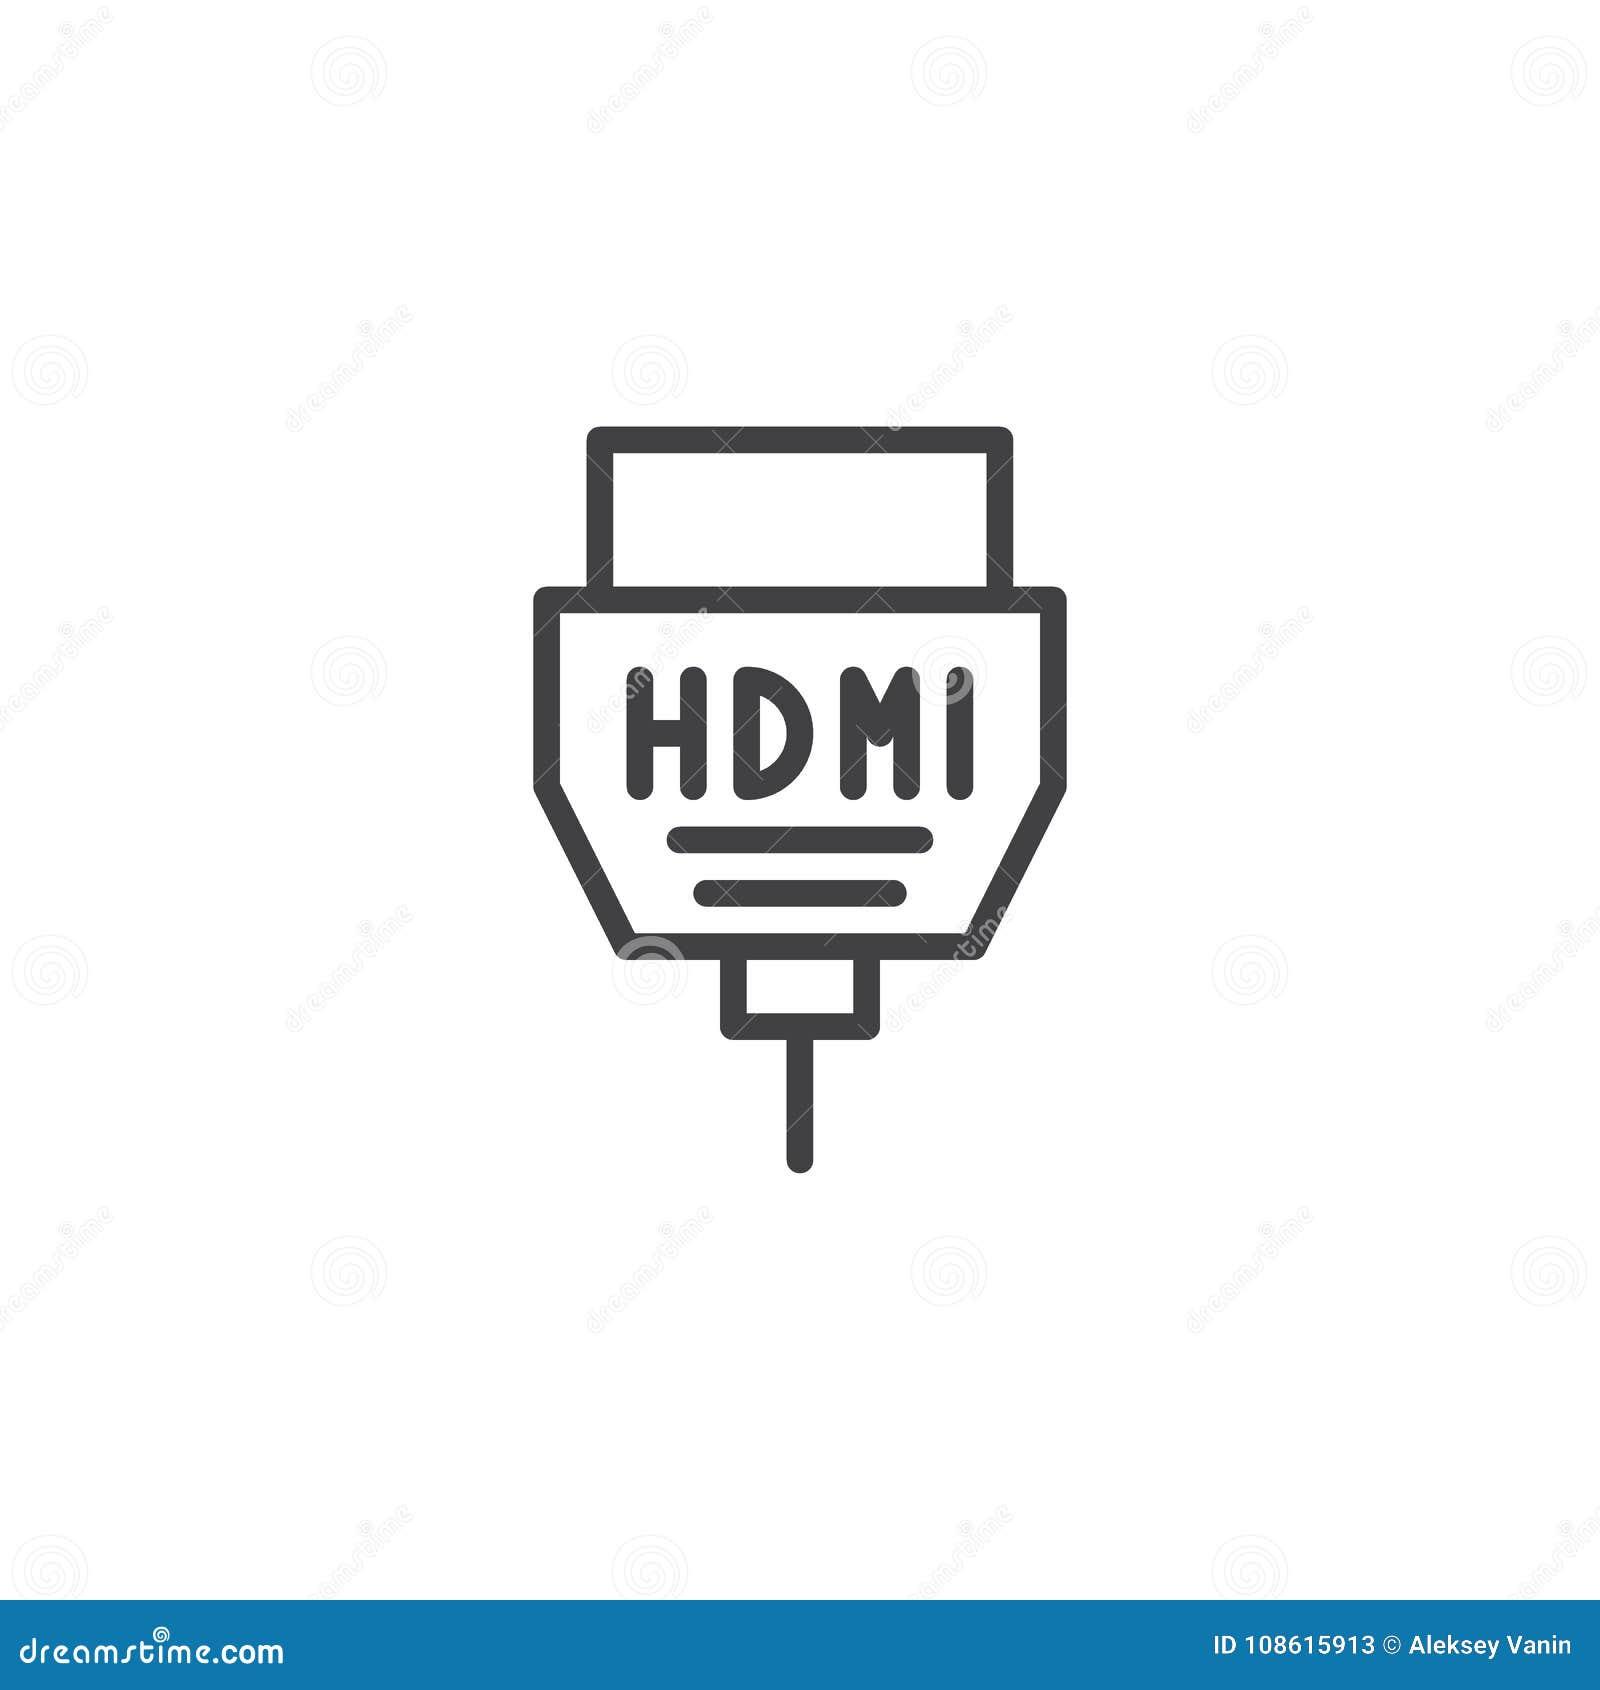 Hdmi Cable Line Icon Stock Vector Illustration Of Design 108615913